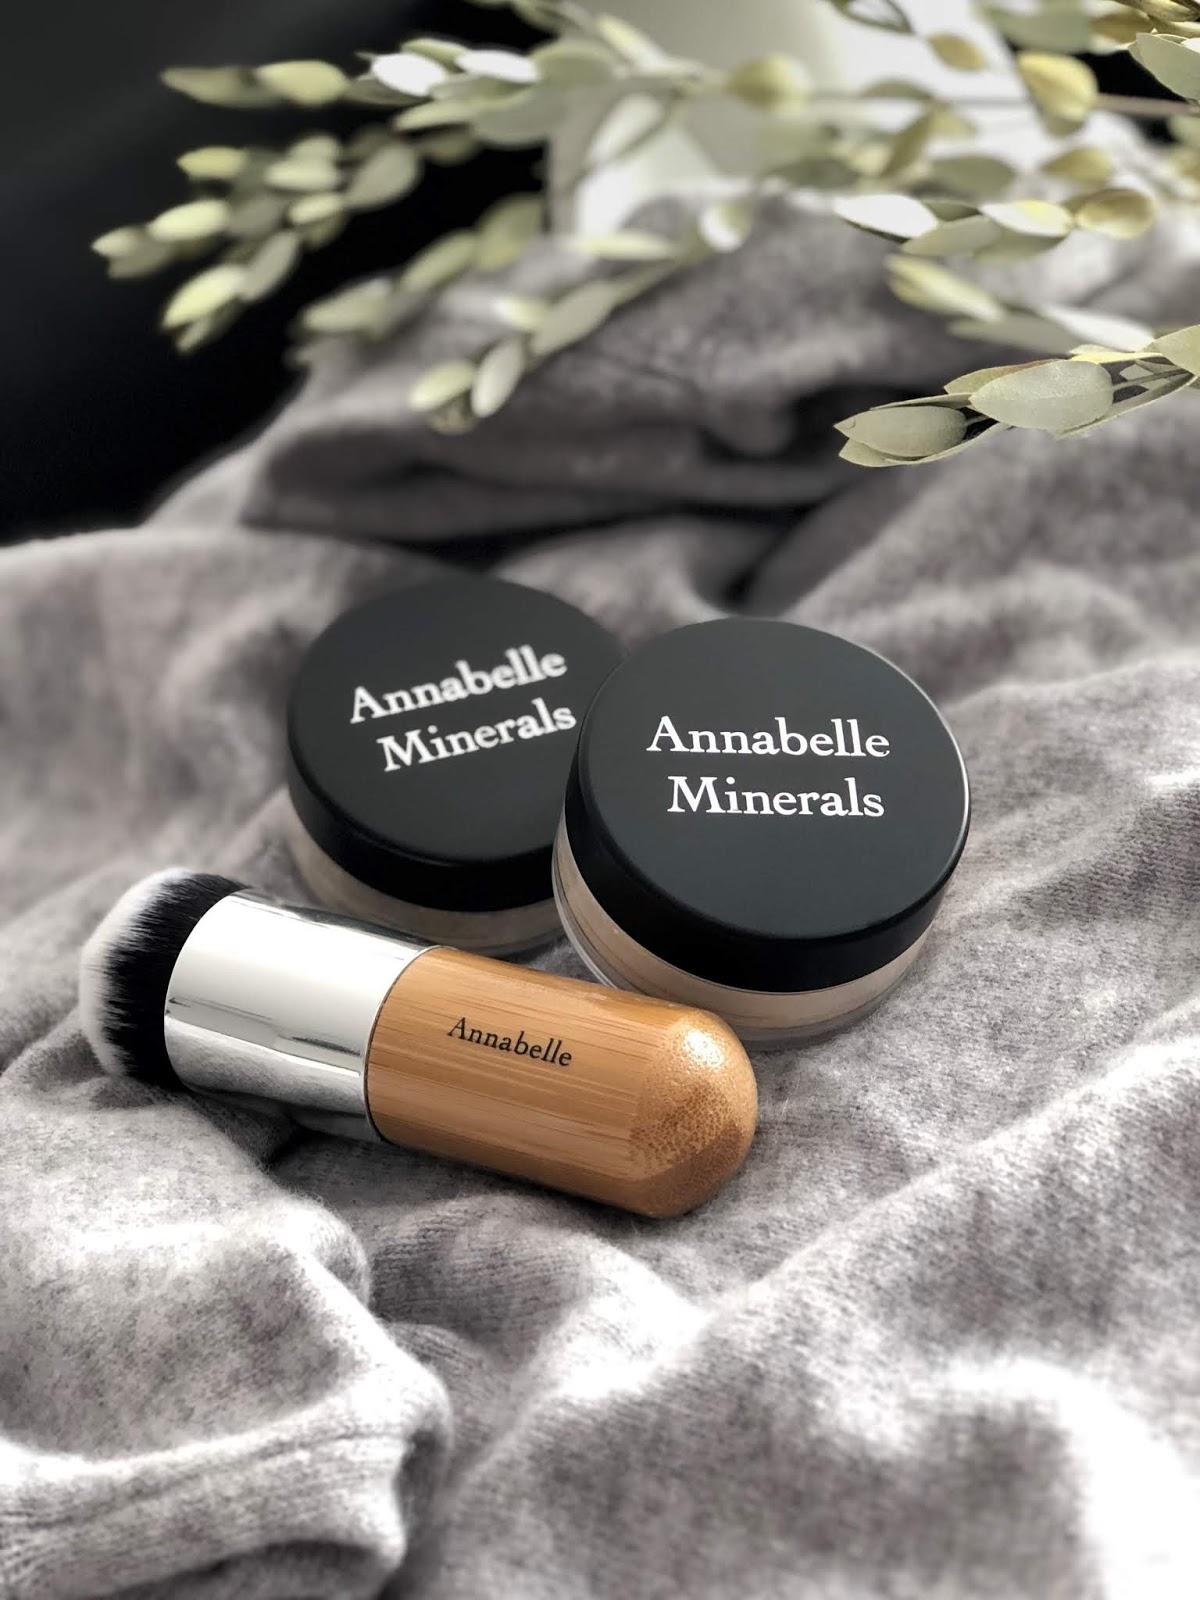 podklad-mineralny-annebelle-minerals